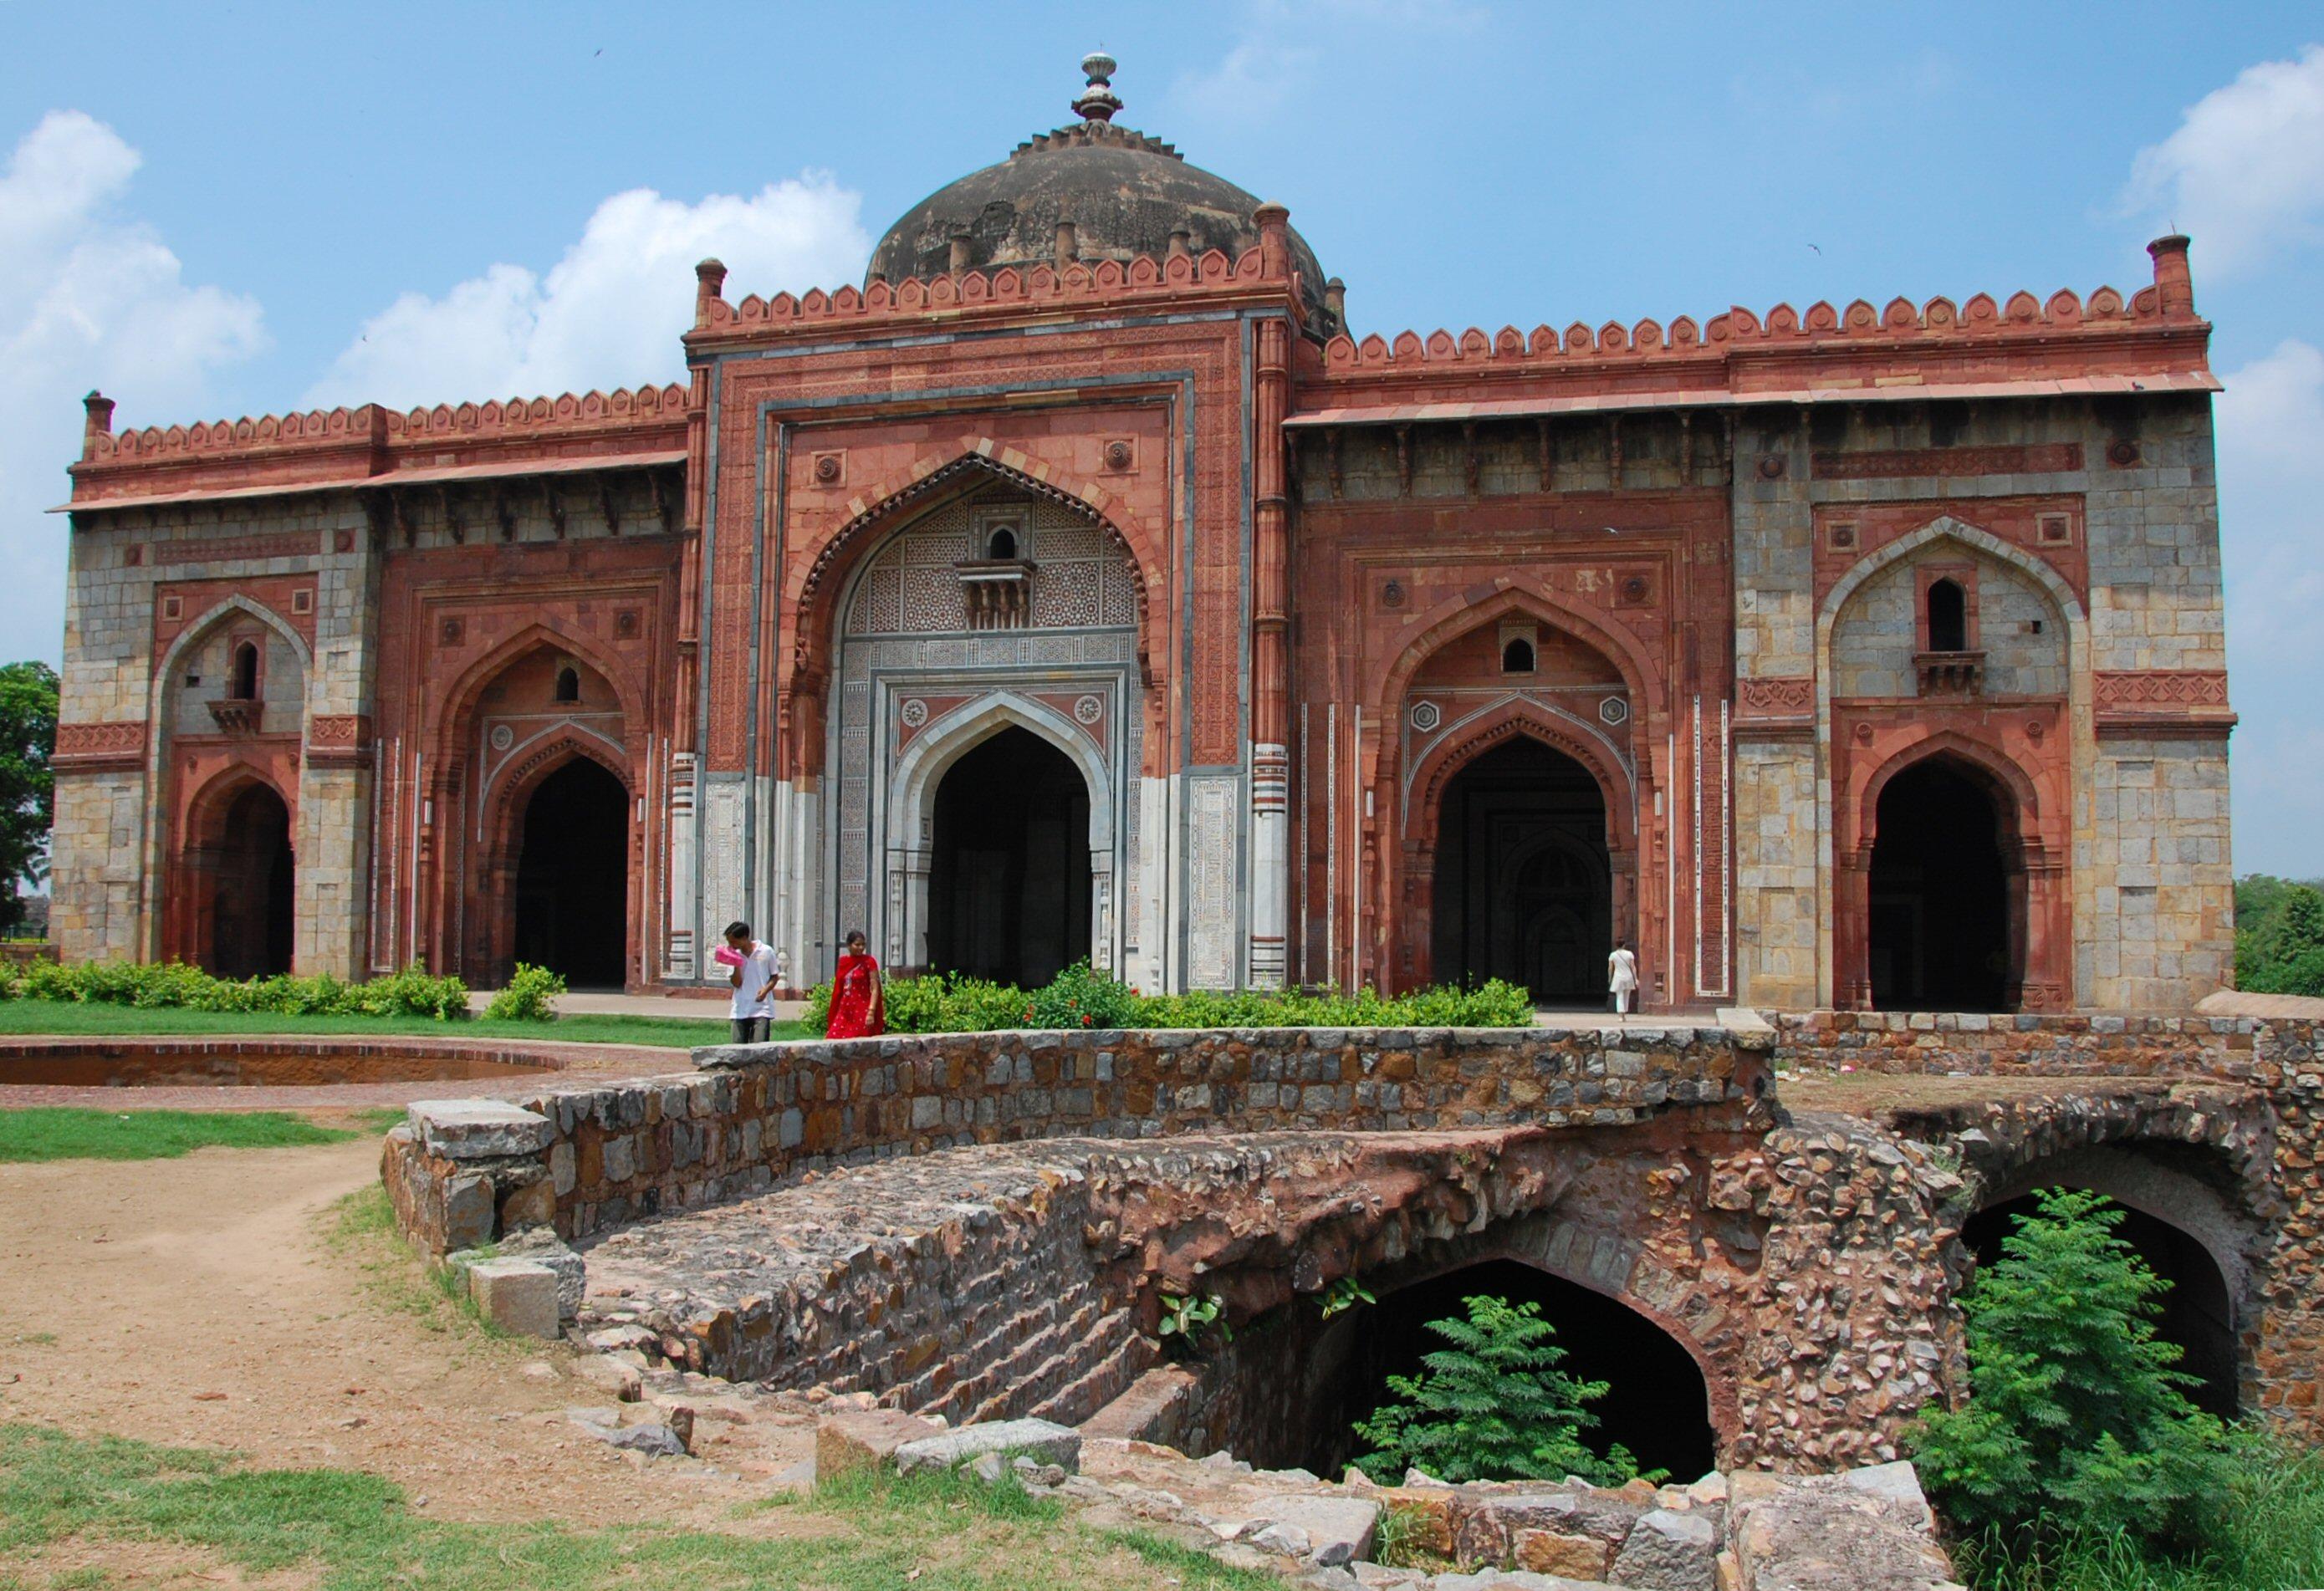 Qila Kuhna Masjid inside Puran Qila, Delhi